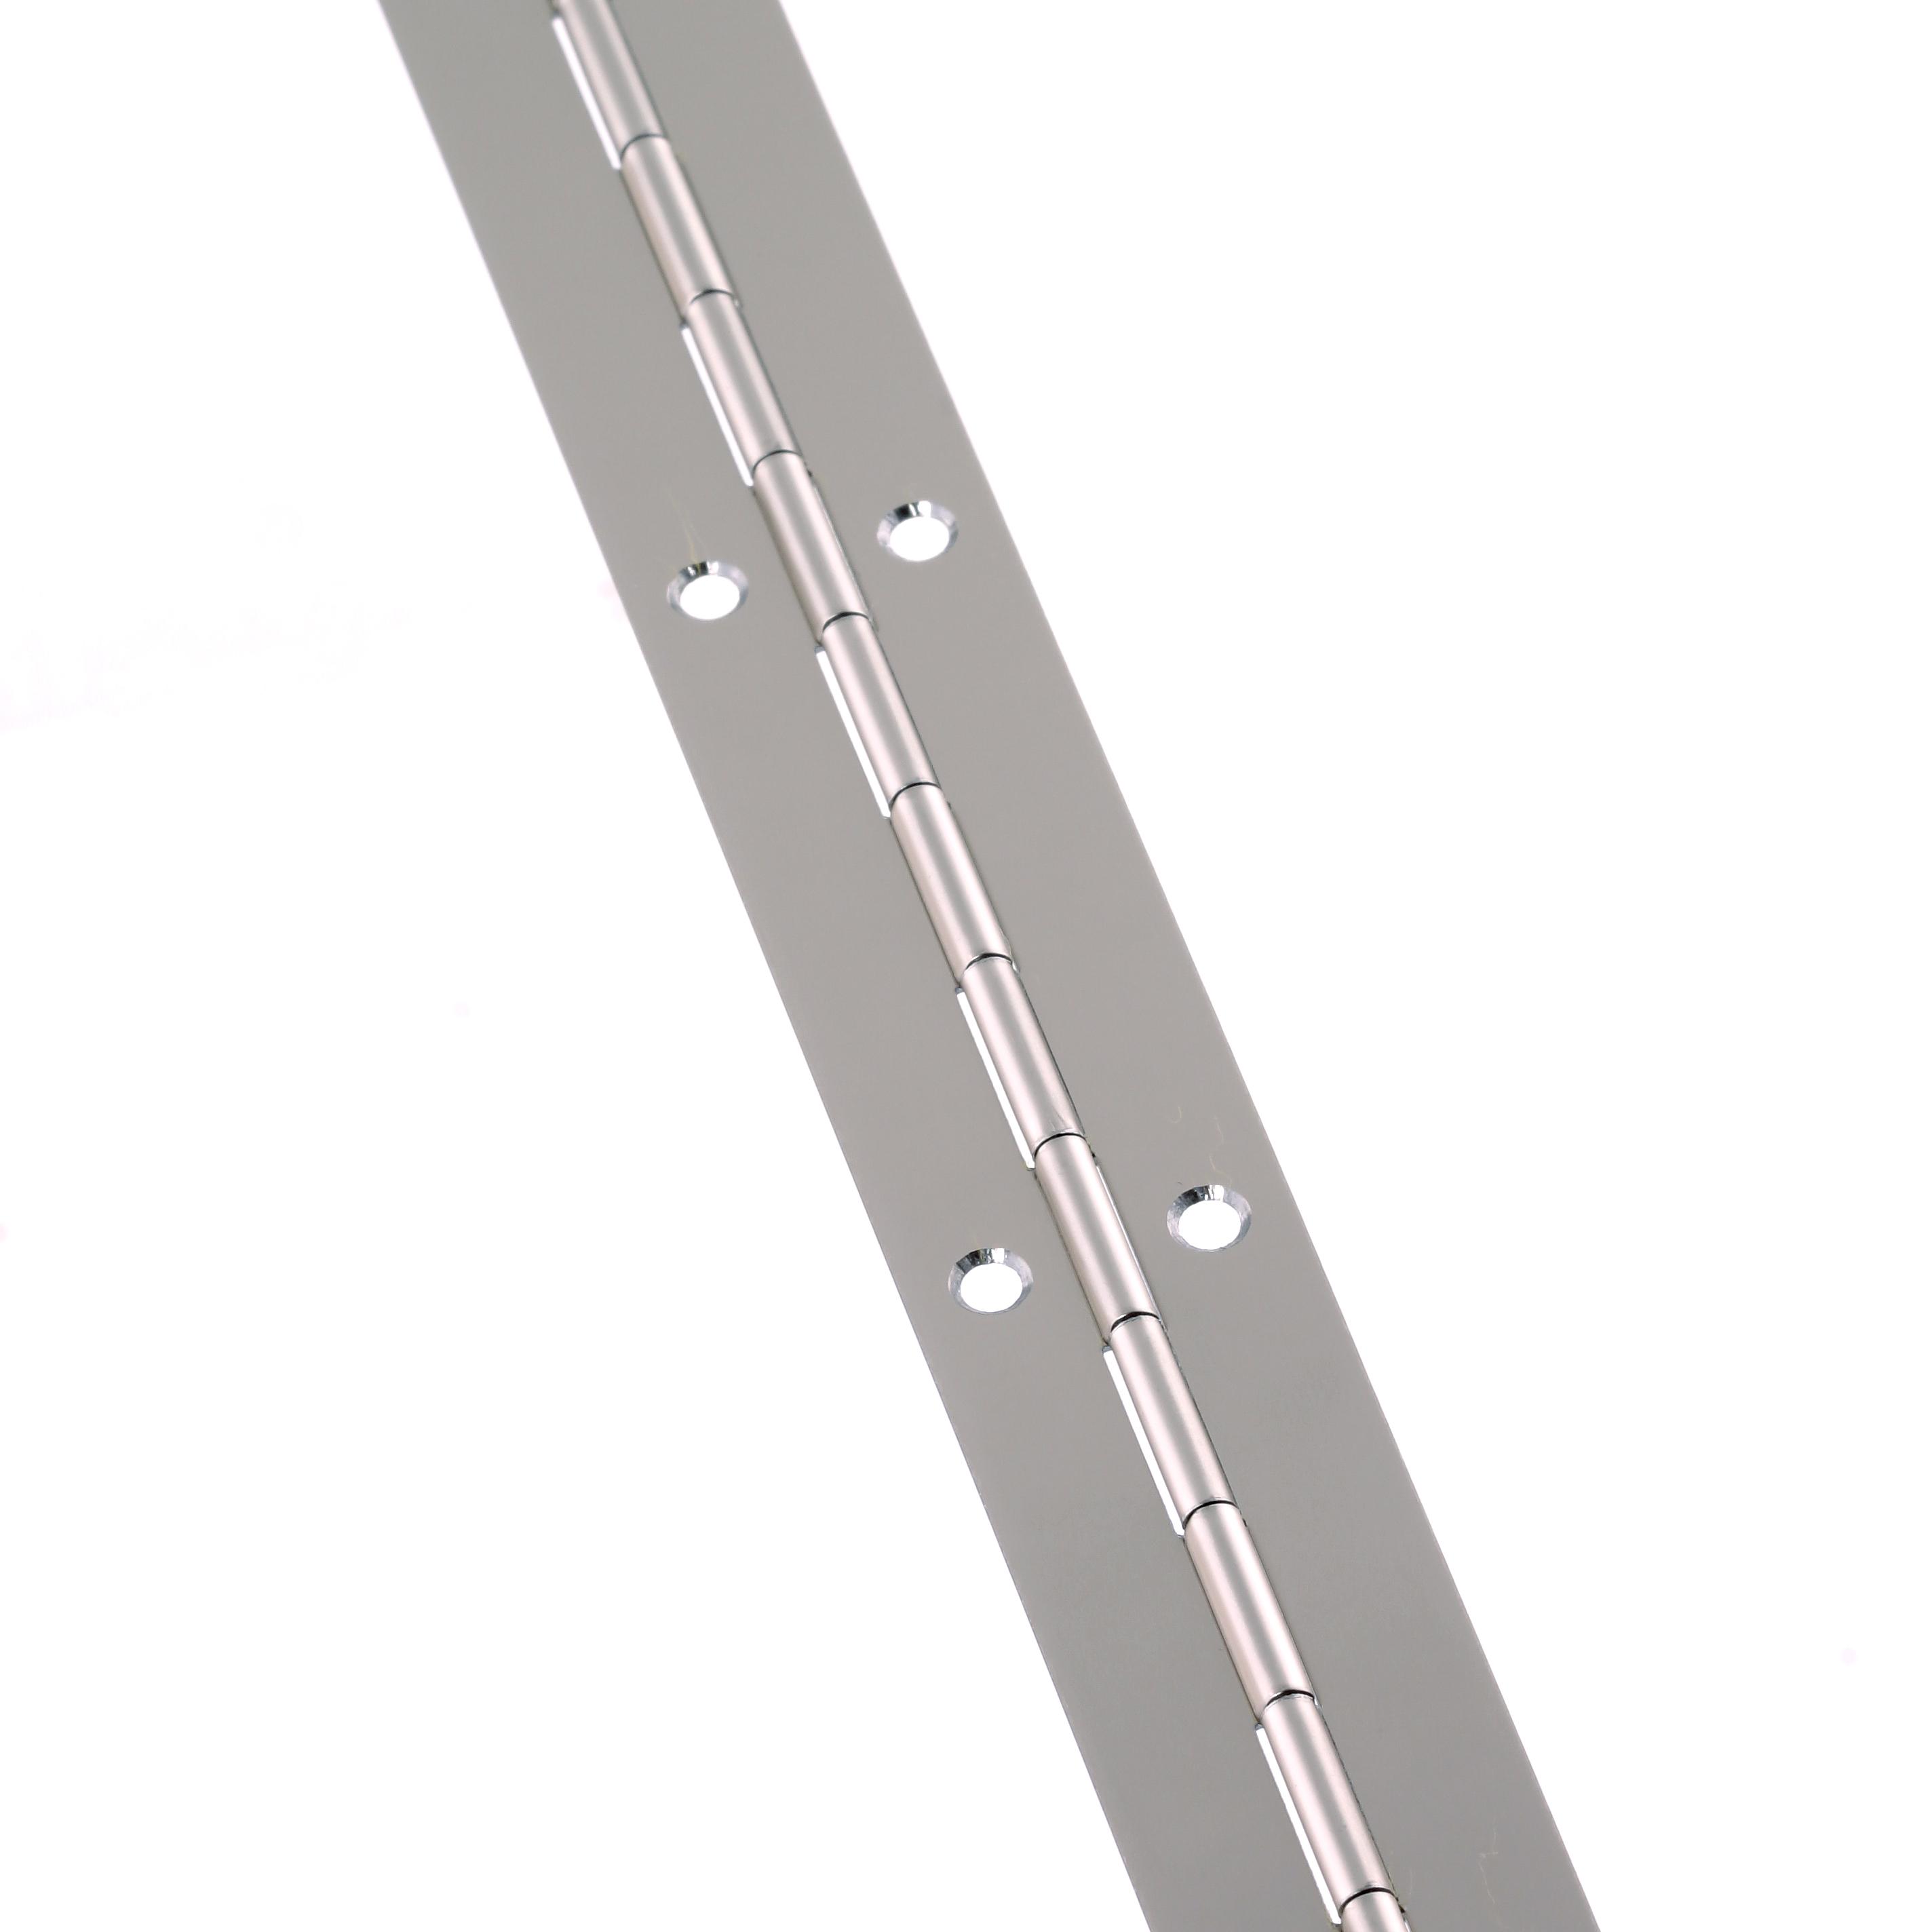 Steel Piano Hinge - 1800 x 25 x 0.7mm - Nickel Plated)